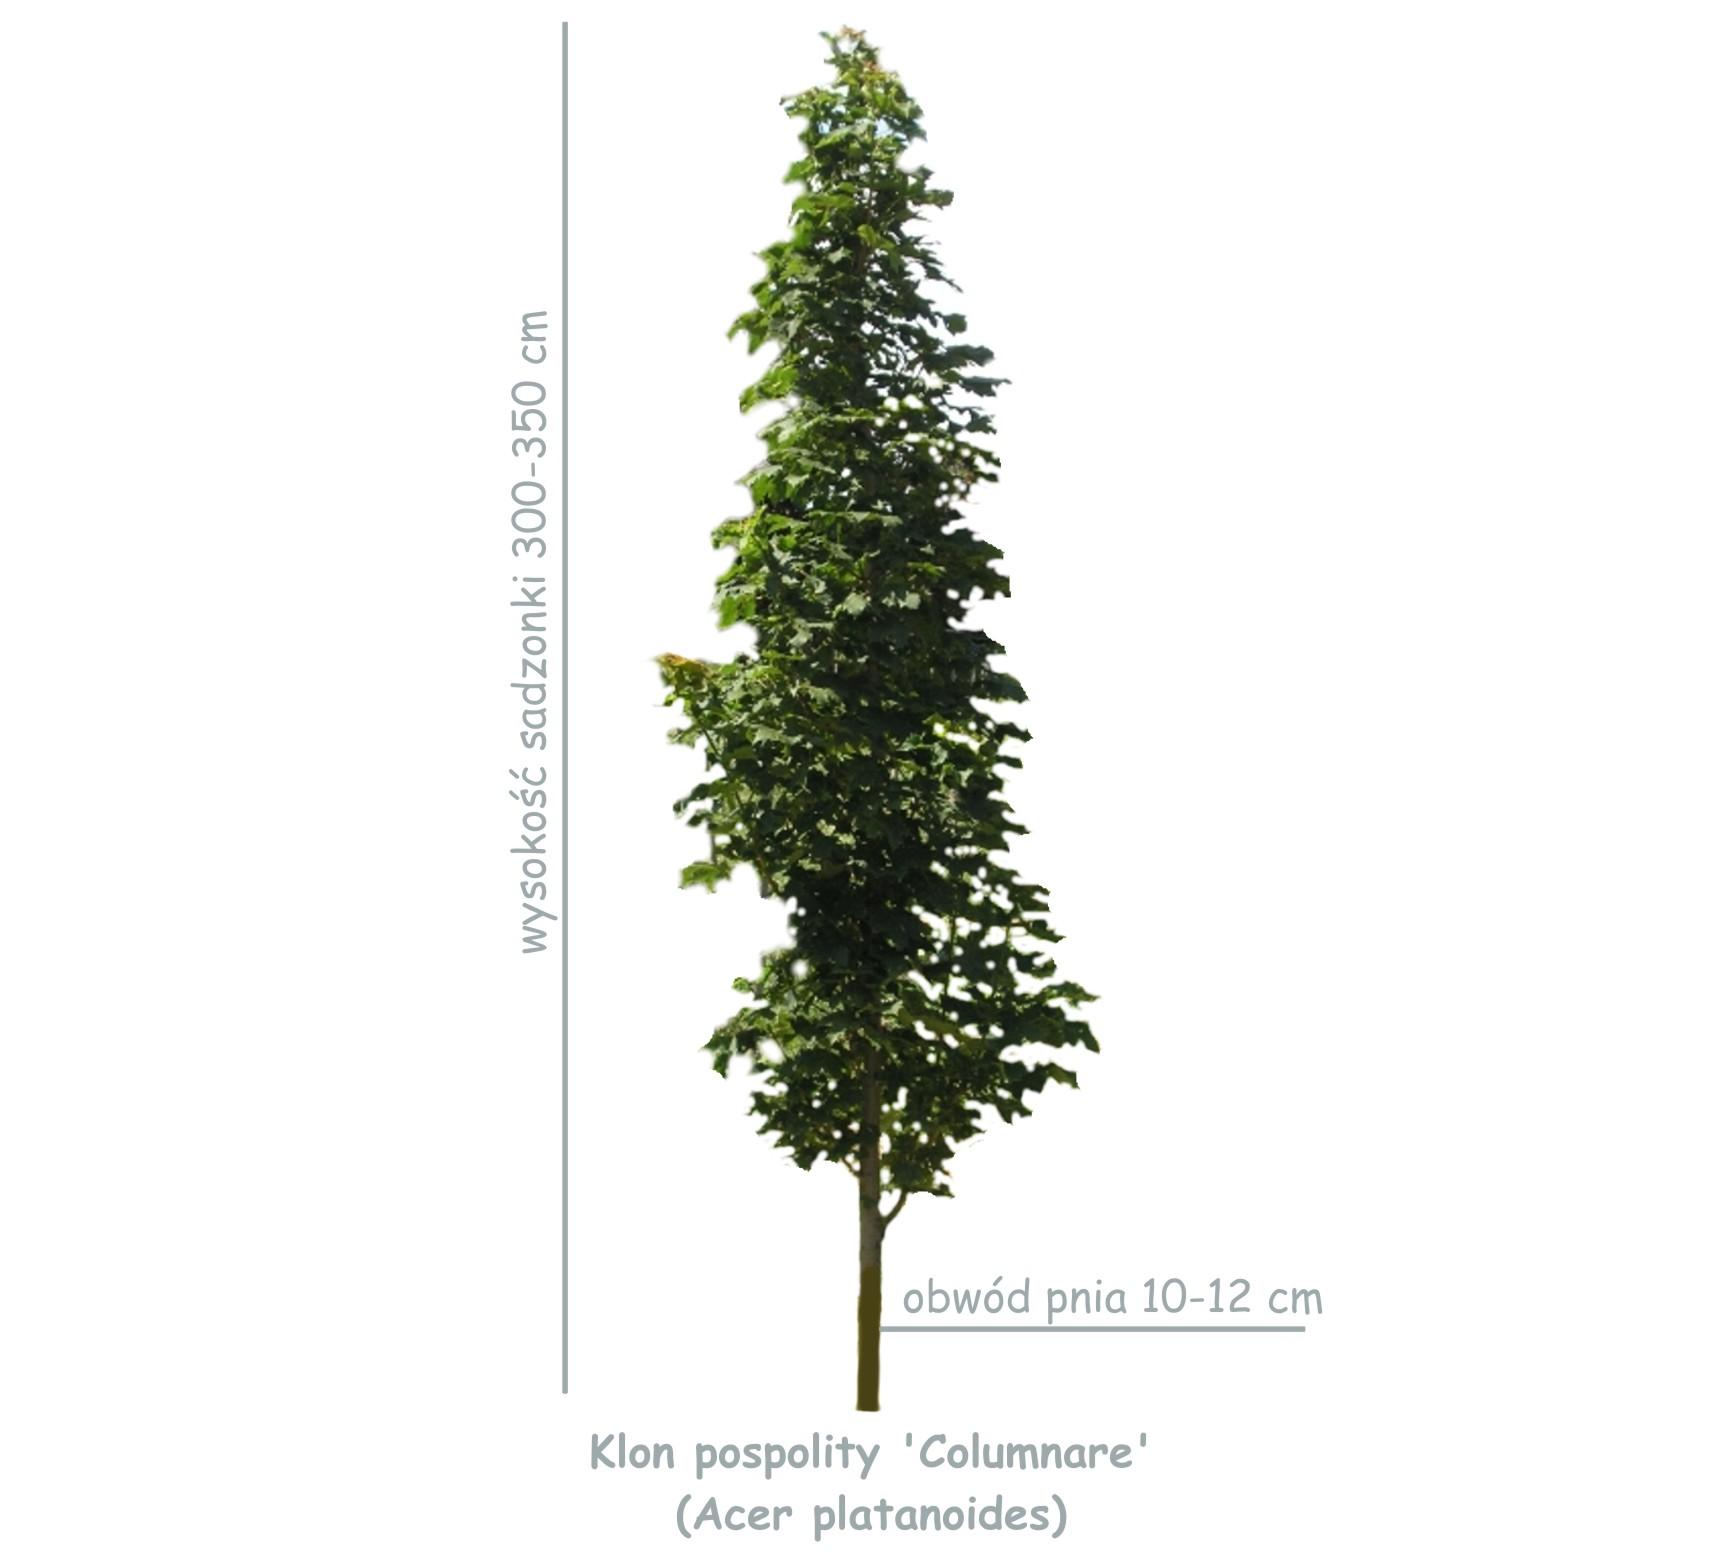 Klon pospolity 'Columnare' (Acer platanoides) sadzonka o obwodzie 10-12 cm